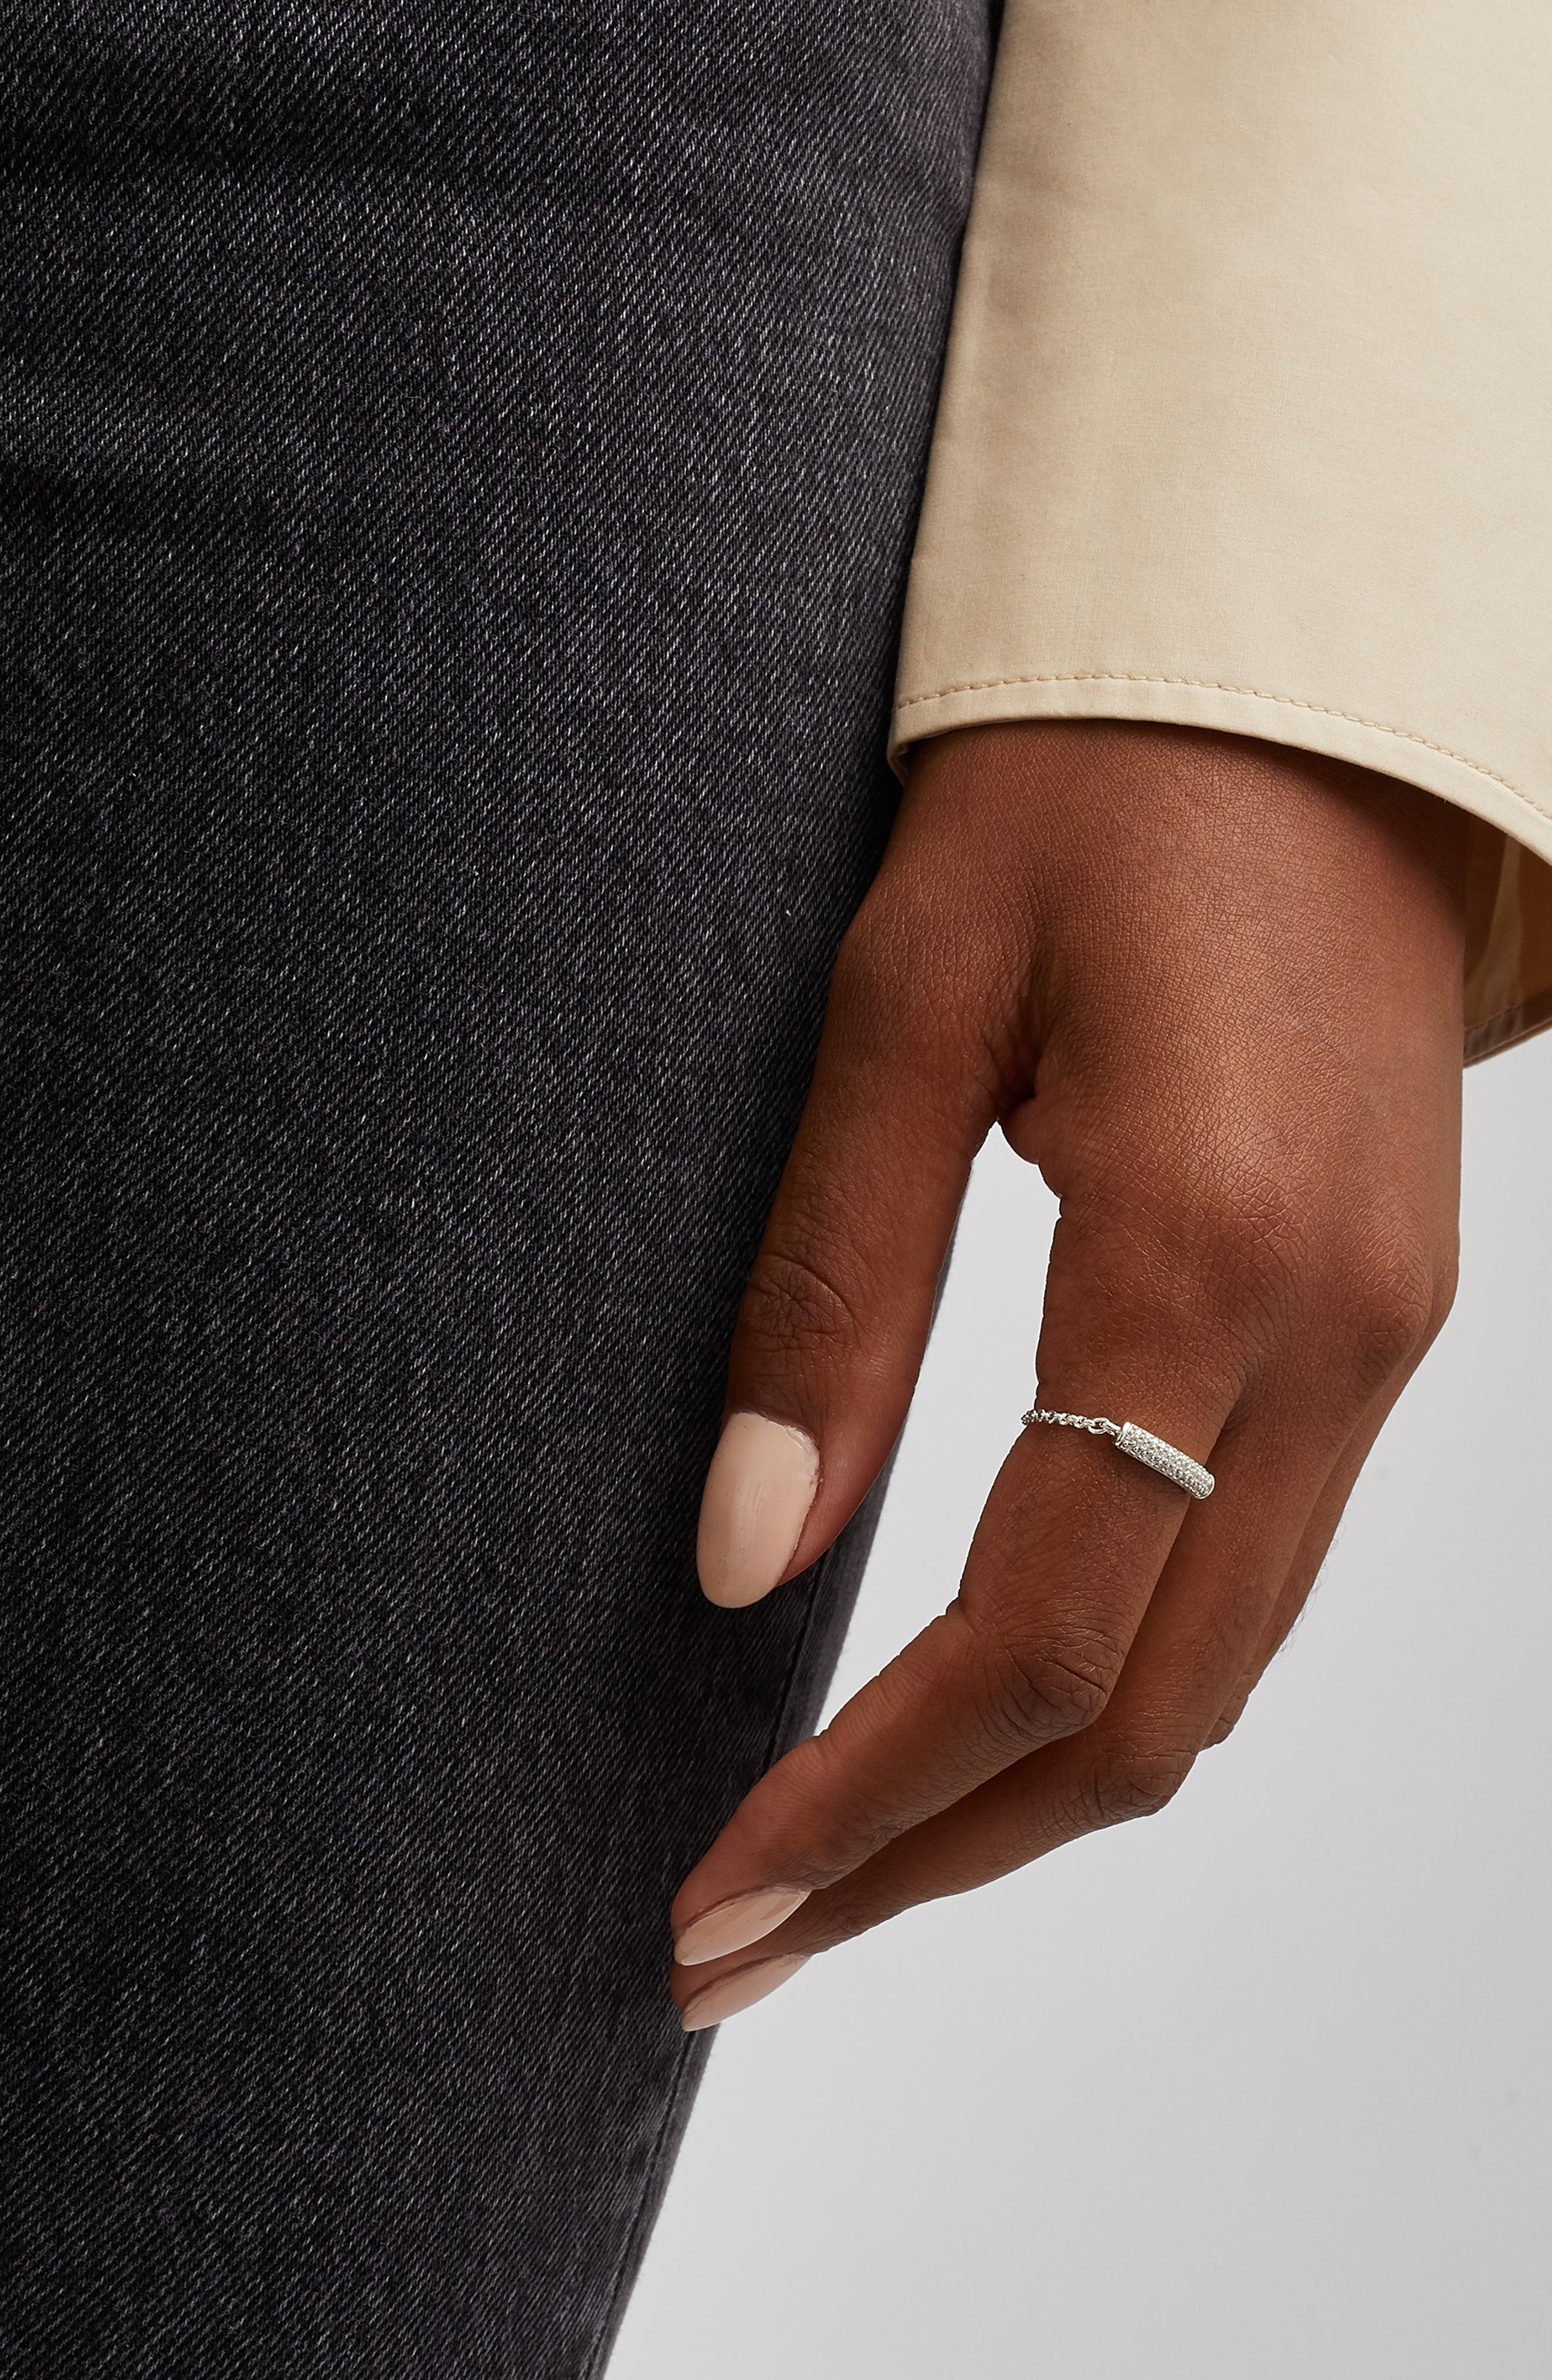 Fiji Bar Friendship Diamond Chain Ring,                             Alternate thumbnail 2, color,                             SILVER